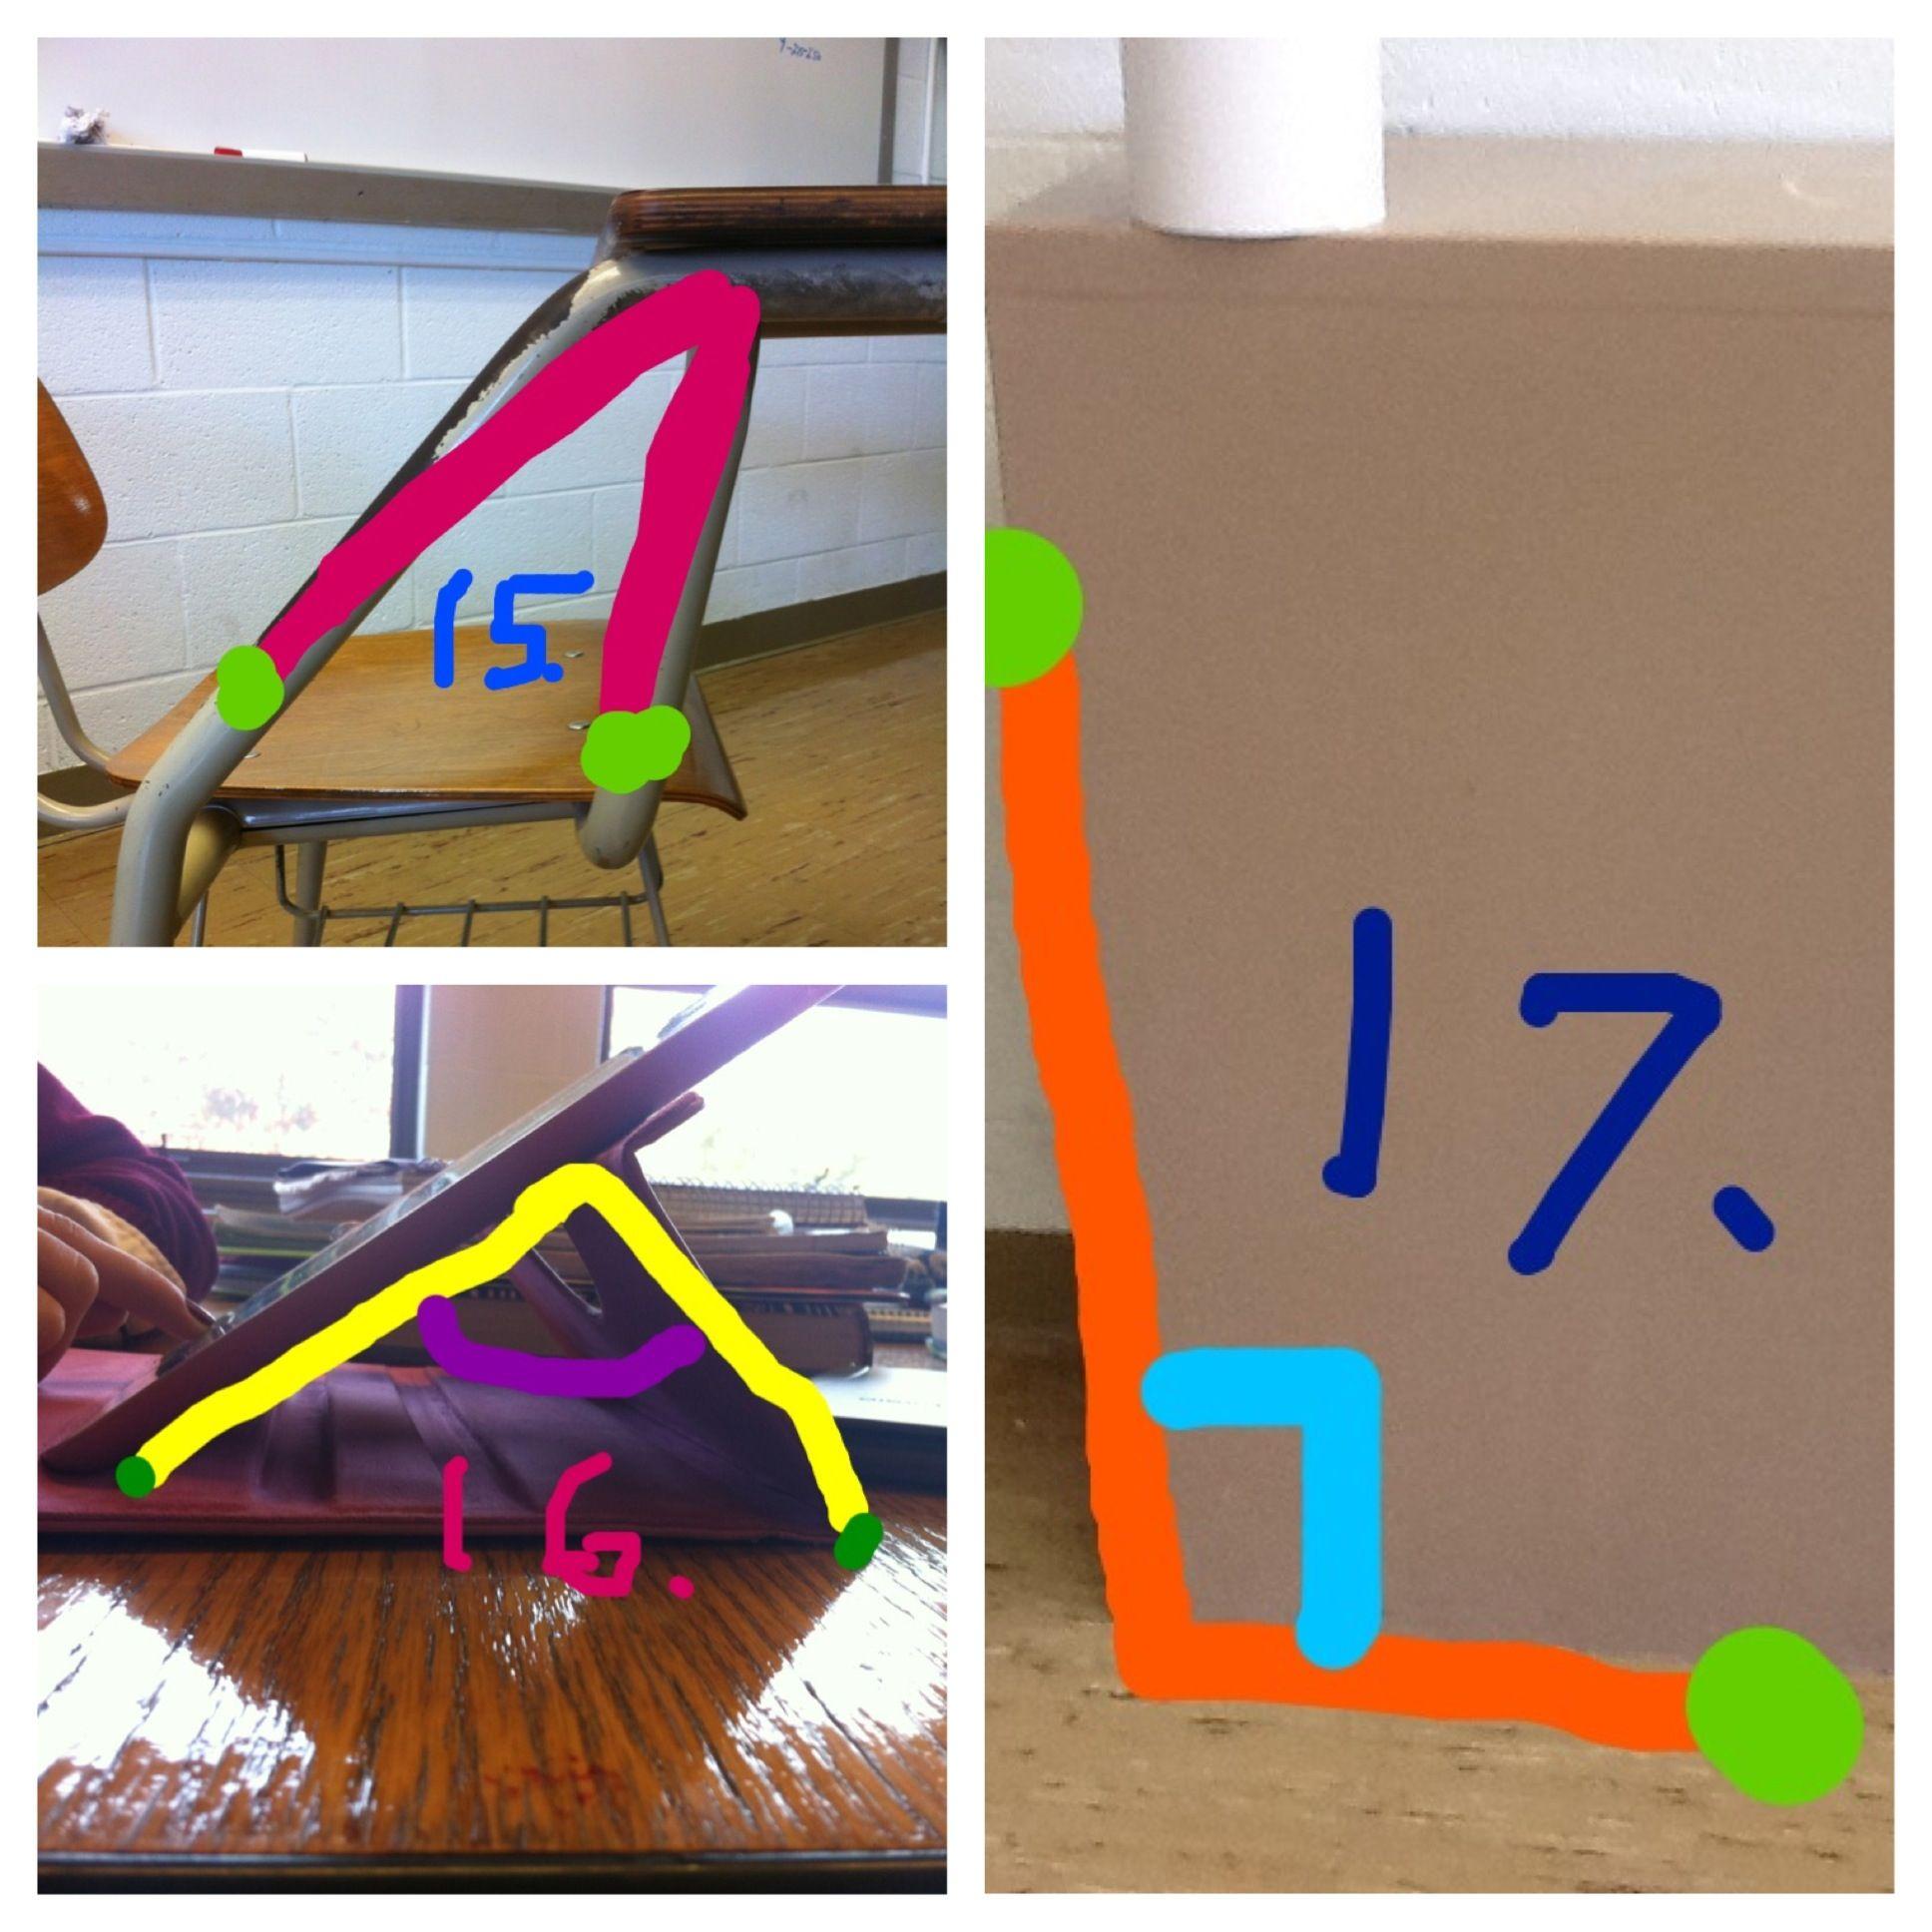 15 Acute Angle 16 Right Angle 17 Obtuse Angle